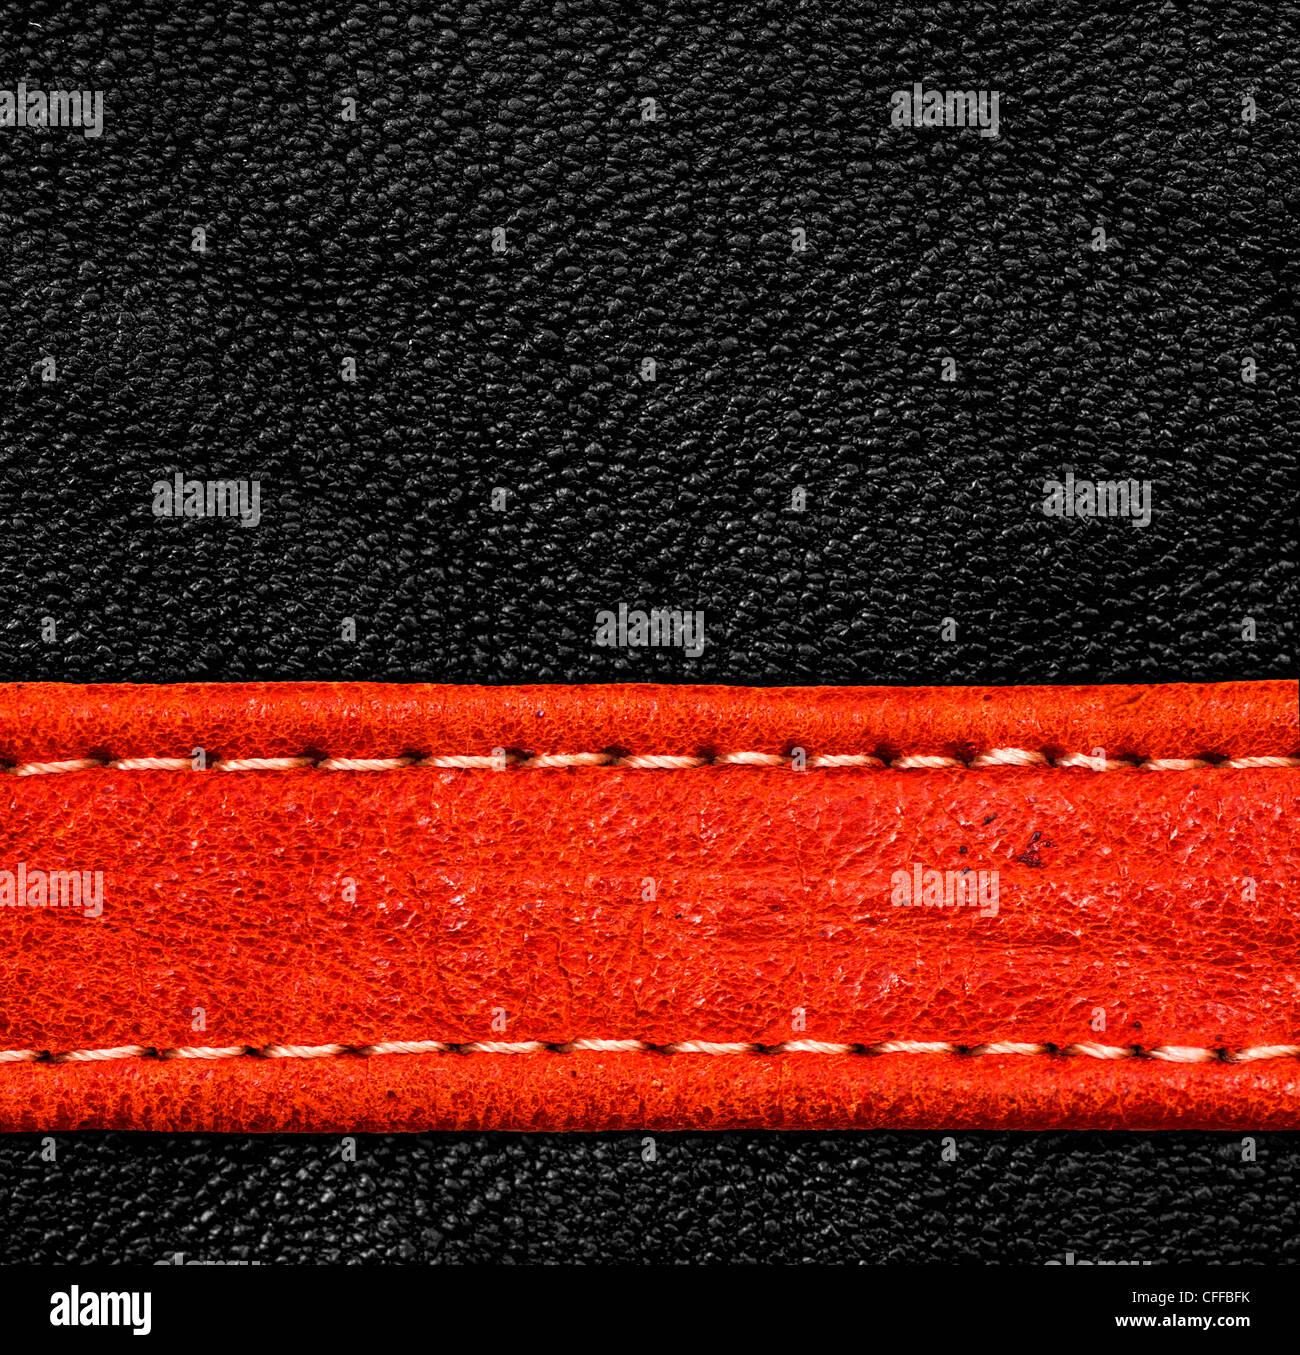 Eine braune Leder-Textur. hohe Auflösung. Stockbild